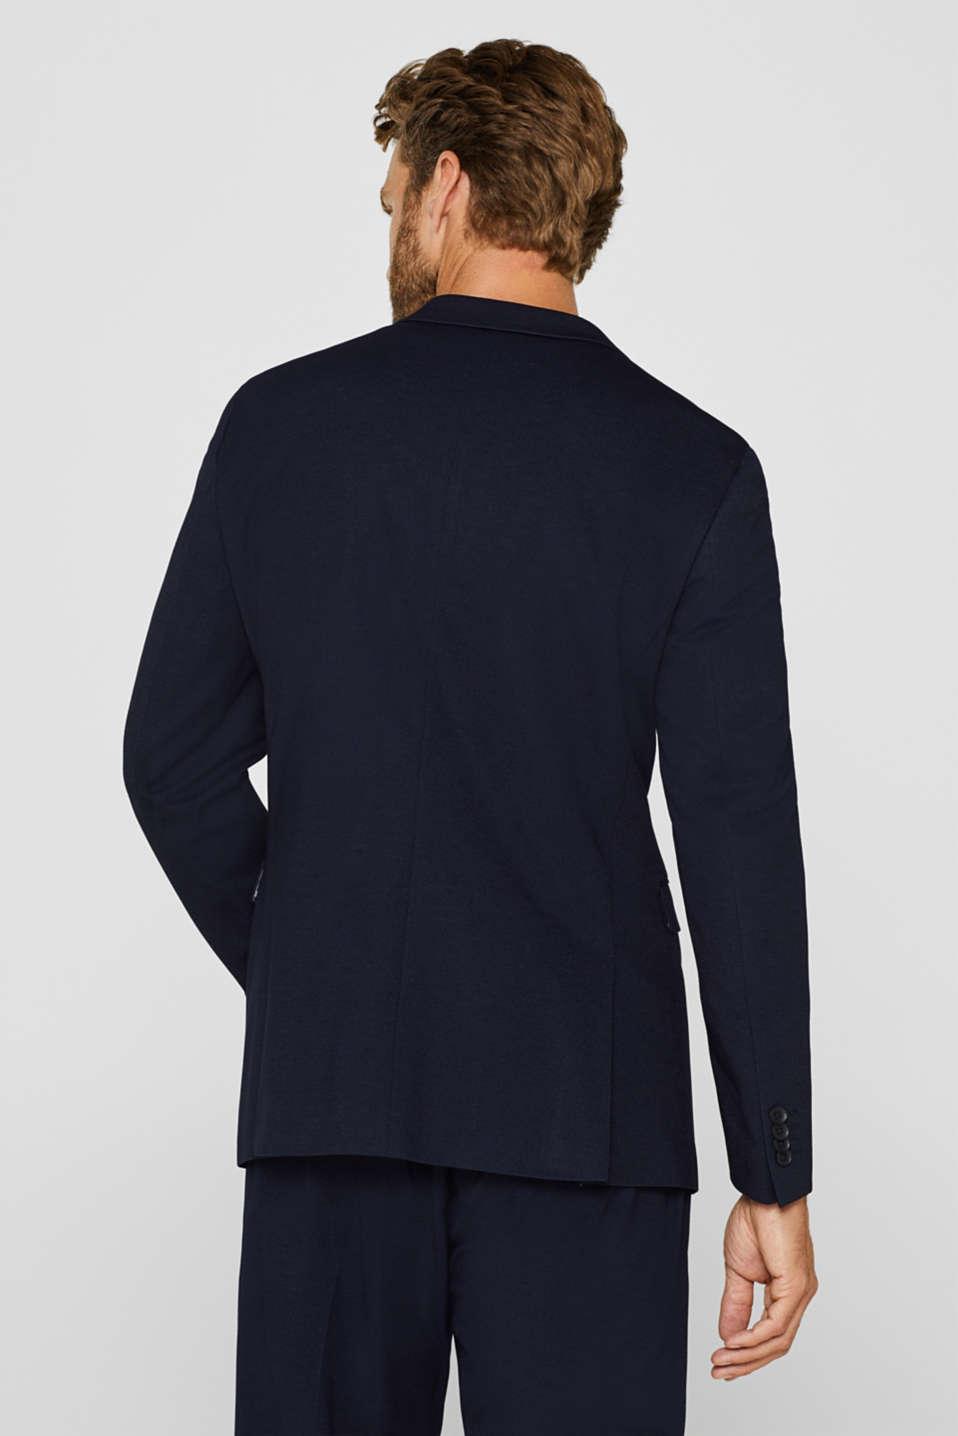 COMFORT SUIT mix + match: Textured jacket, NAVY, detail image number 3